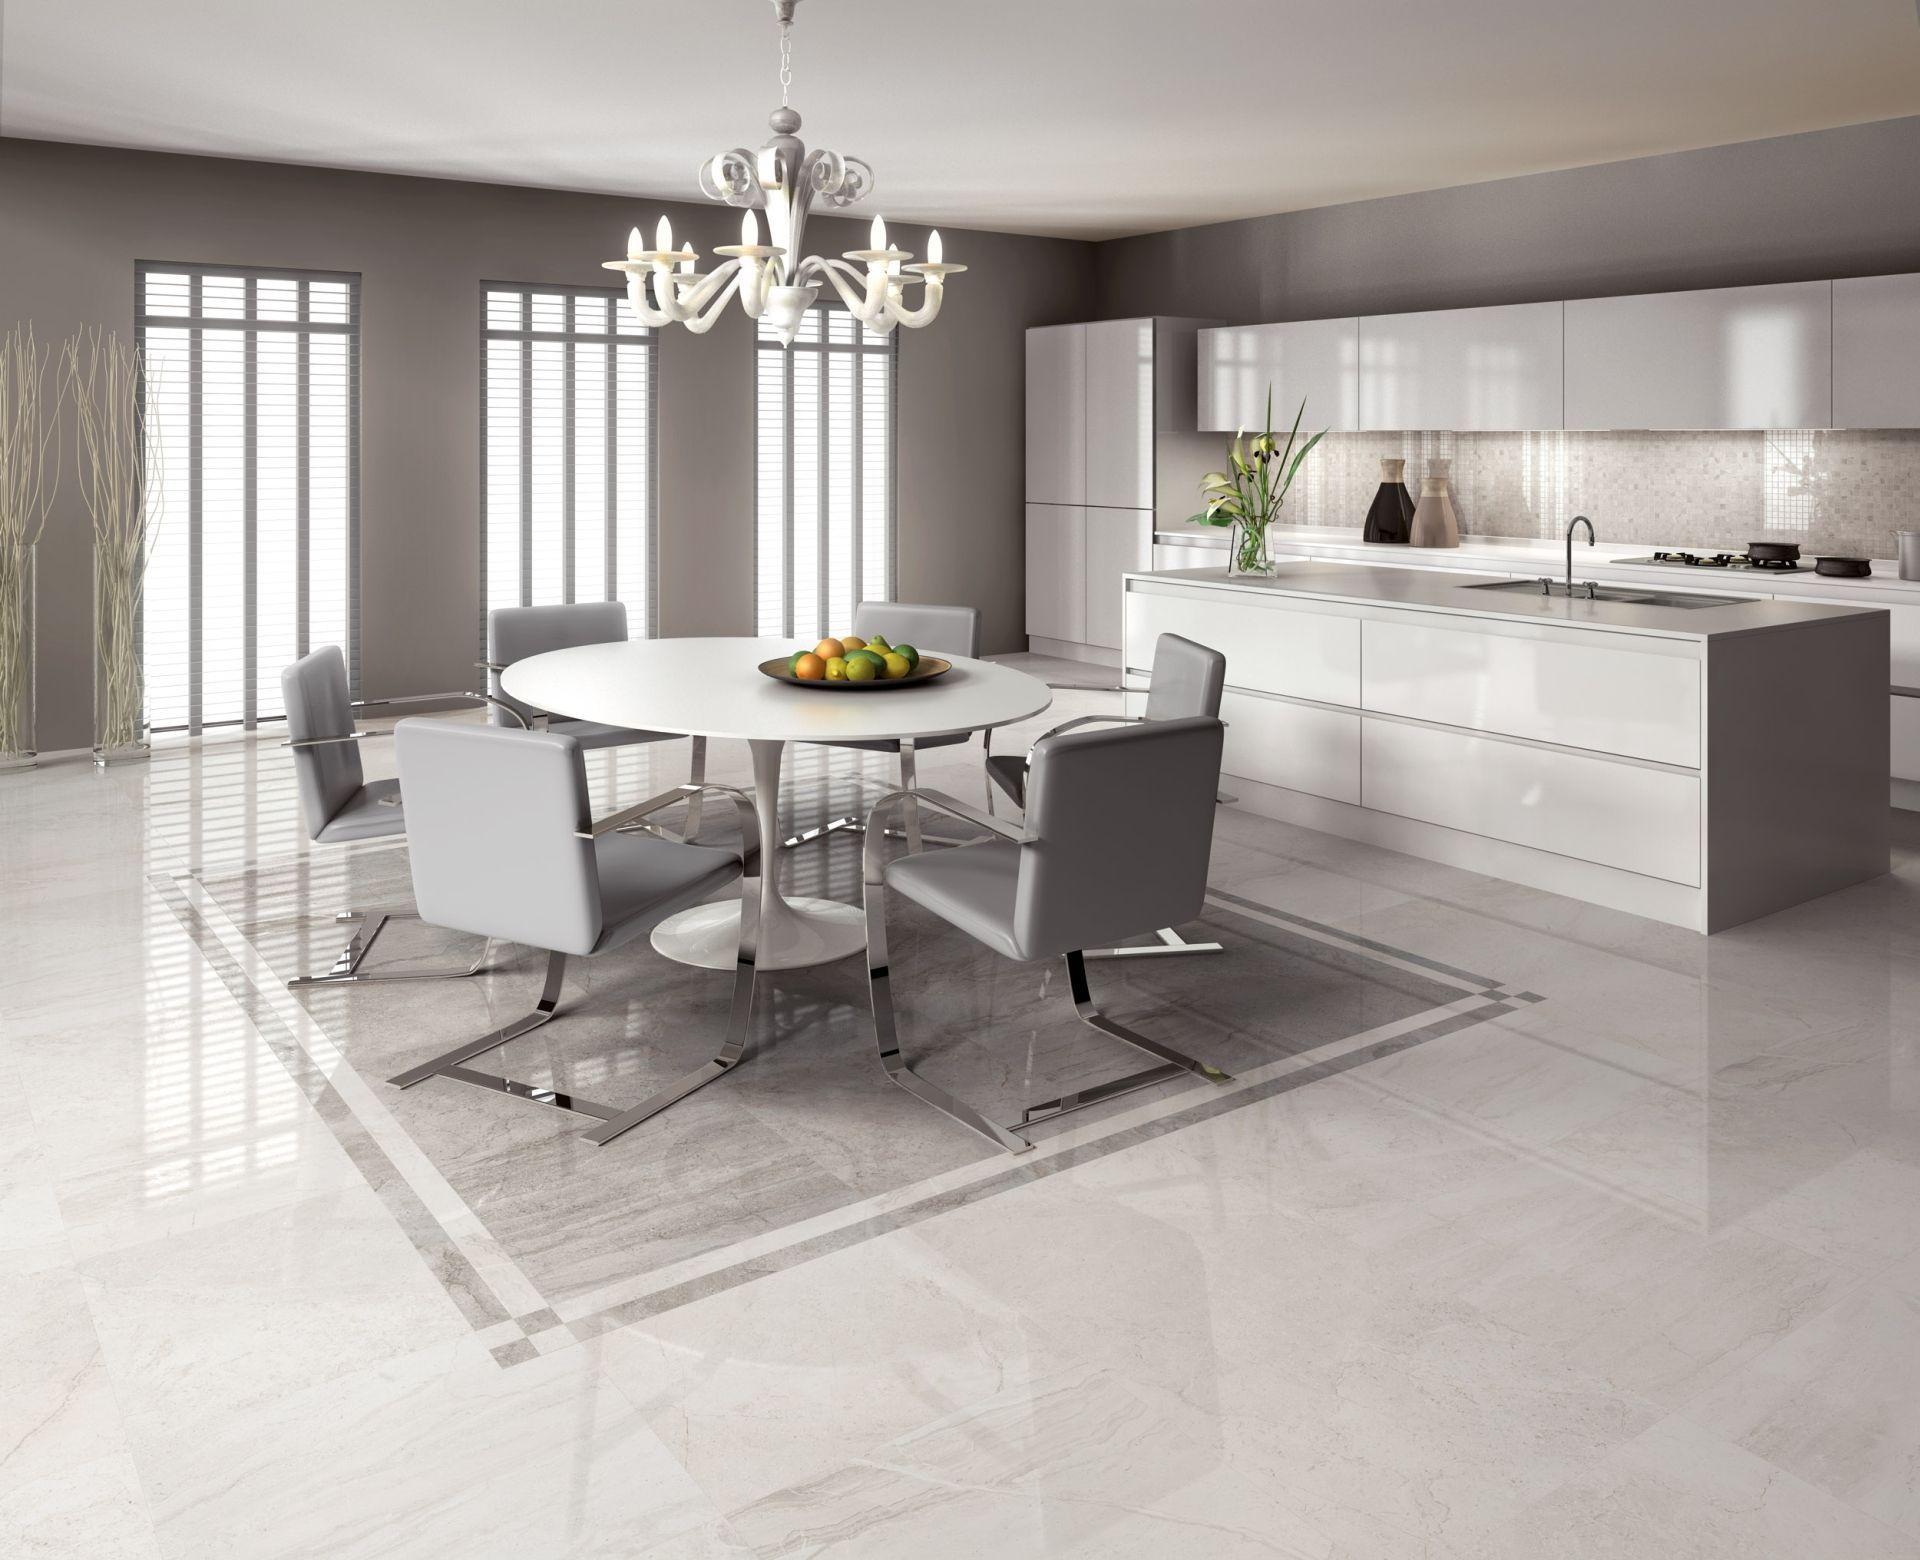 Different Designs For Your Floor Using Ceramics Marble Flooring Design Kitchen Flooring Living Room Tiles